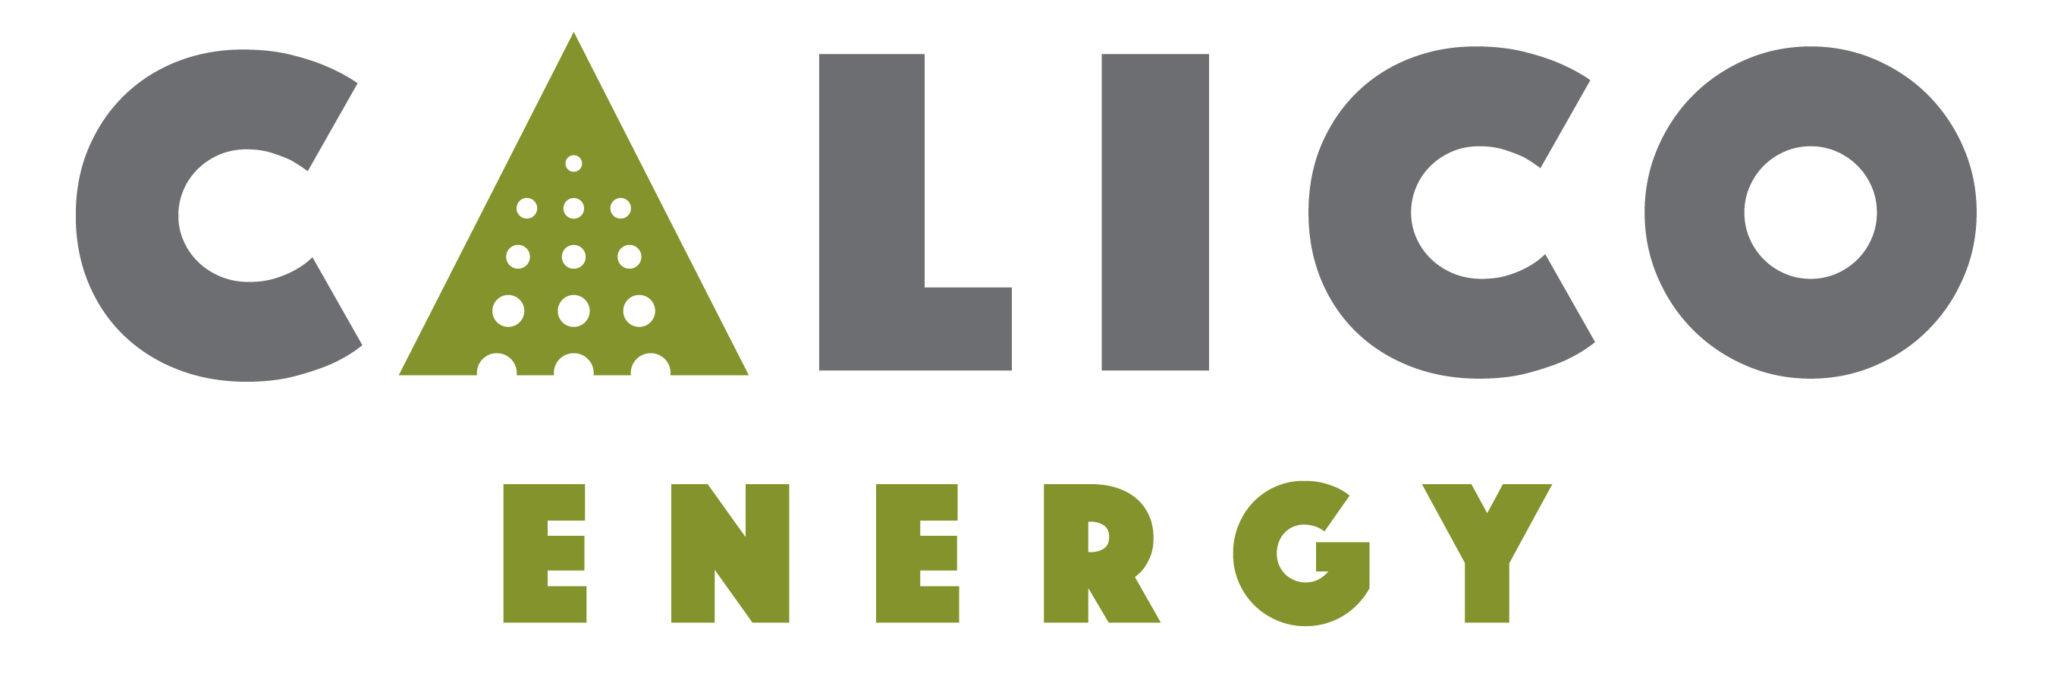 Calico Energy